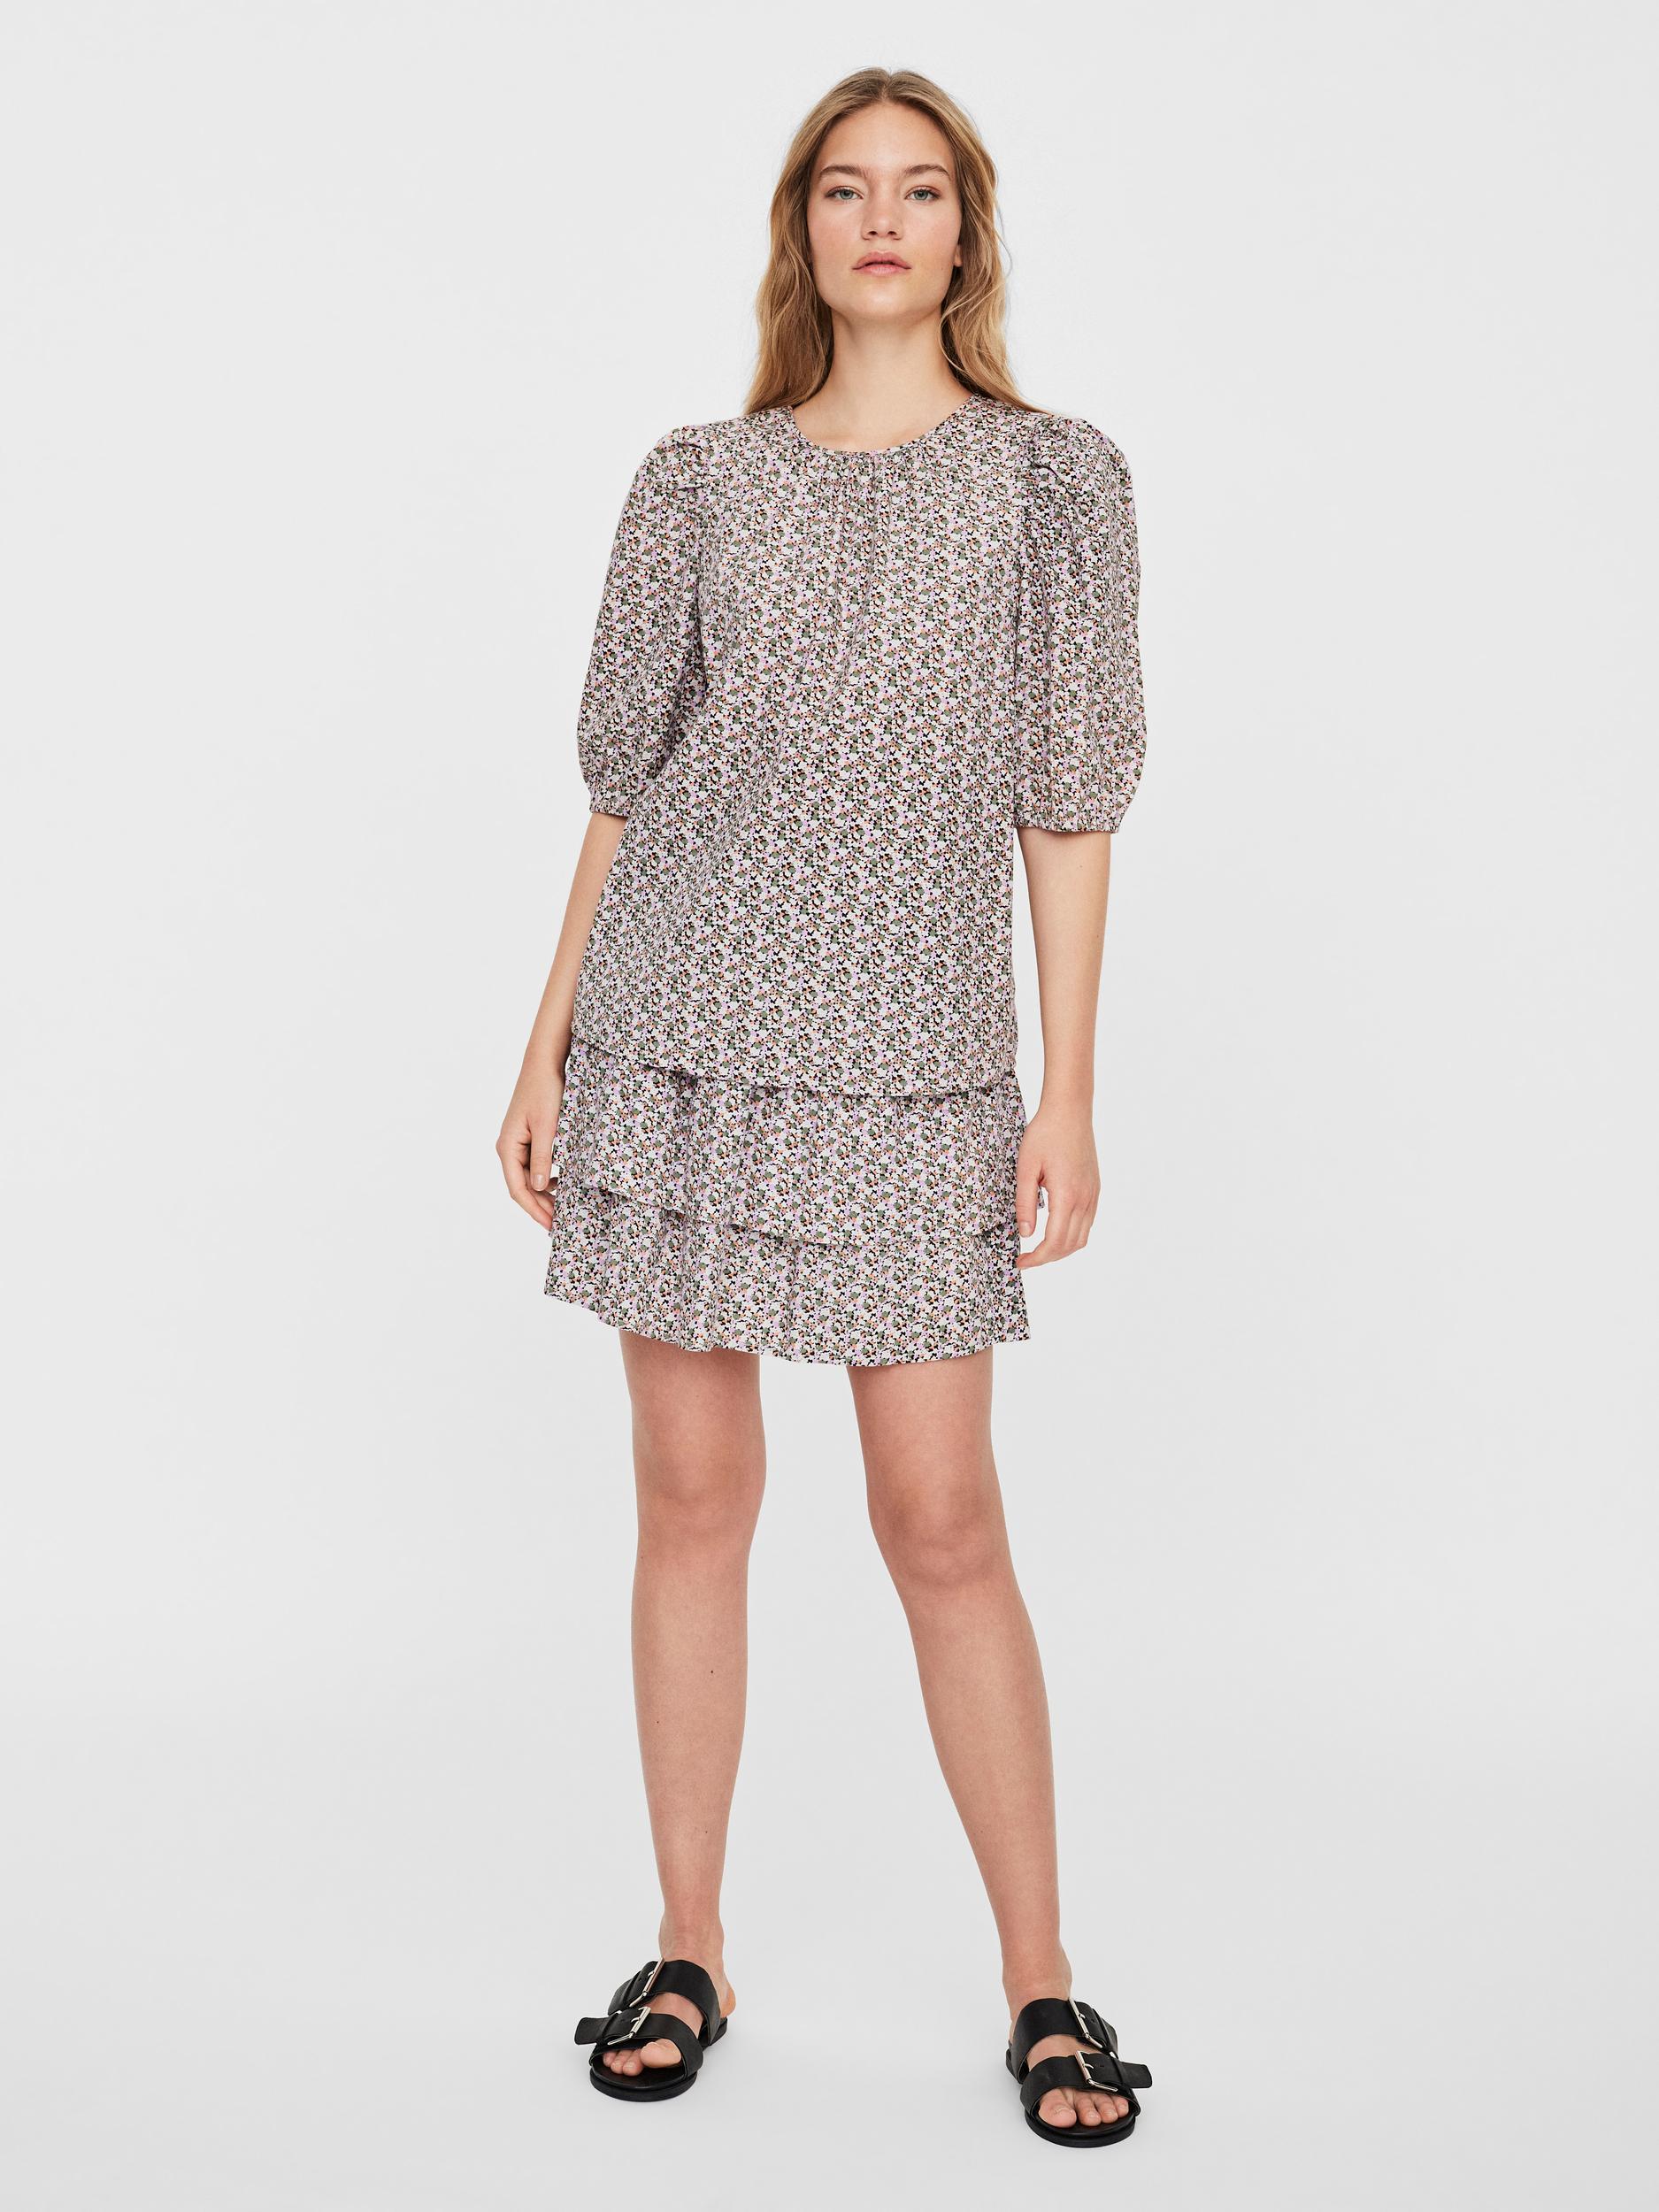 Vero Moda Lykke 2/4 t-shirt, pastel lilac, small